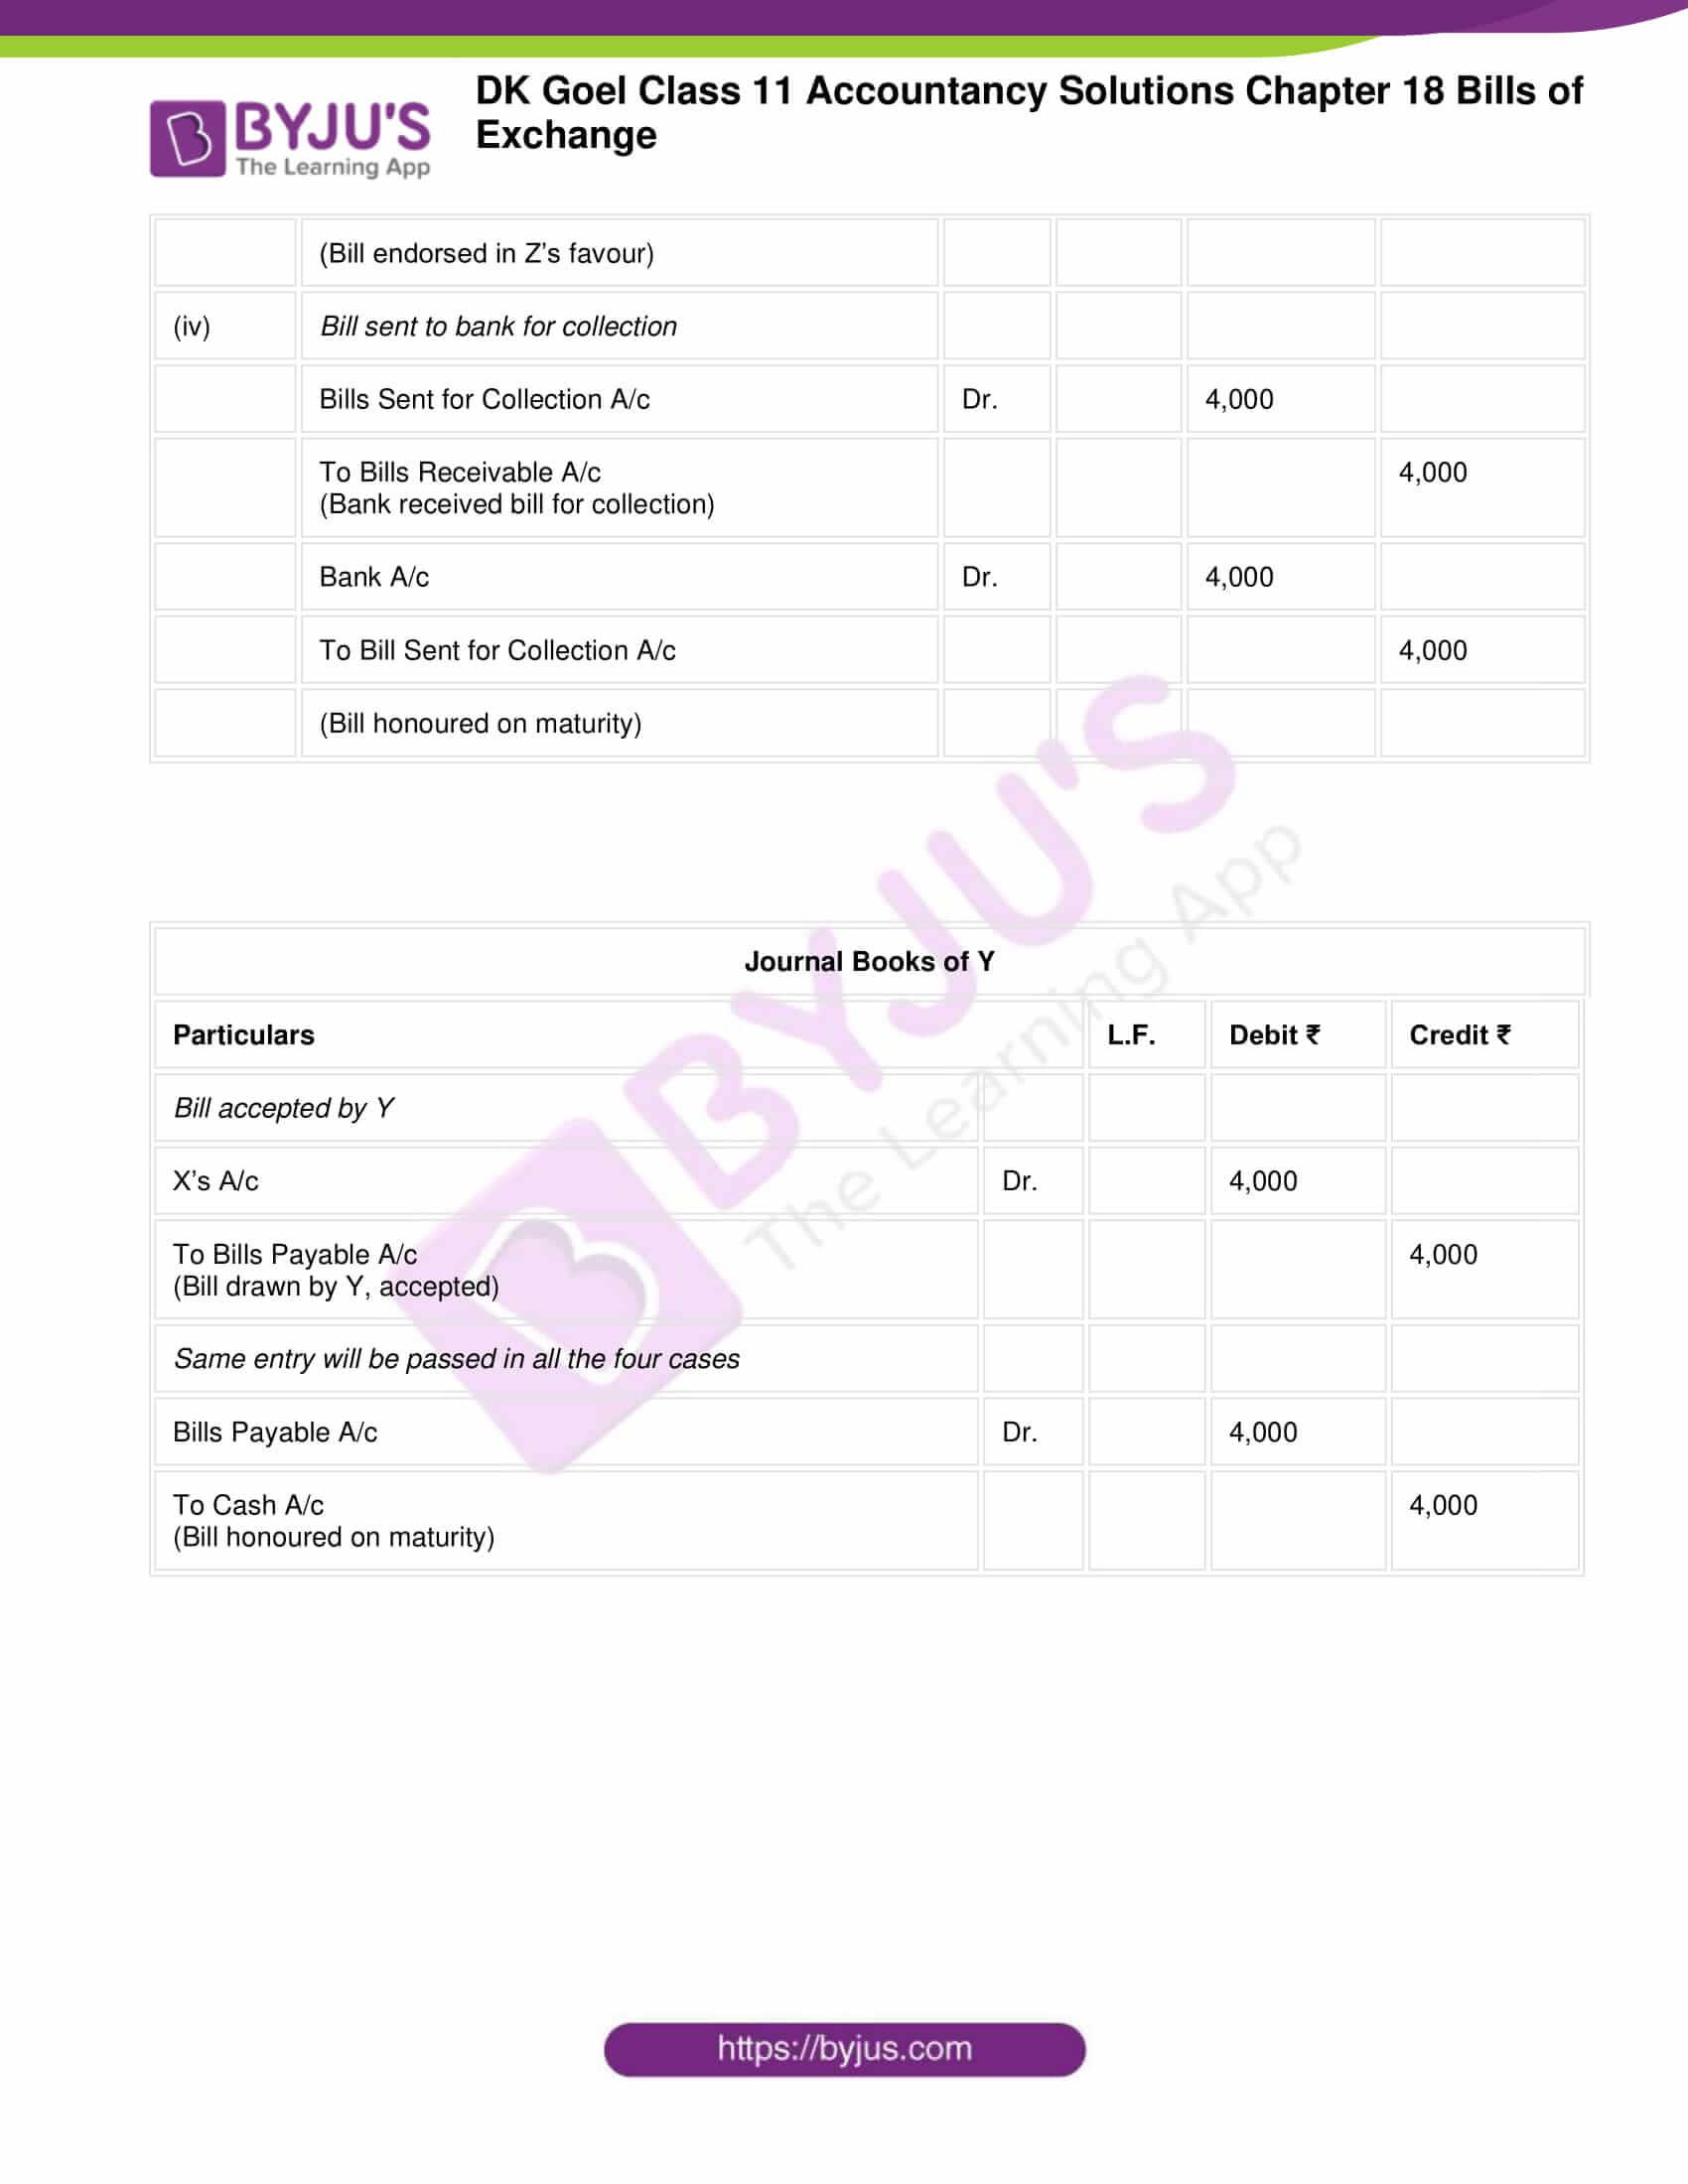 dk goel class 11 accountancy solutions chapter 18 018